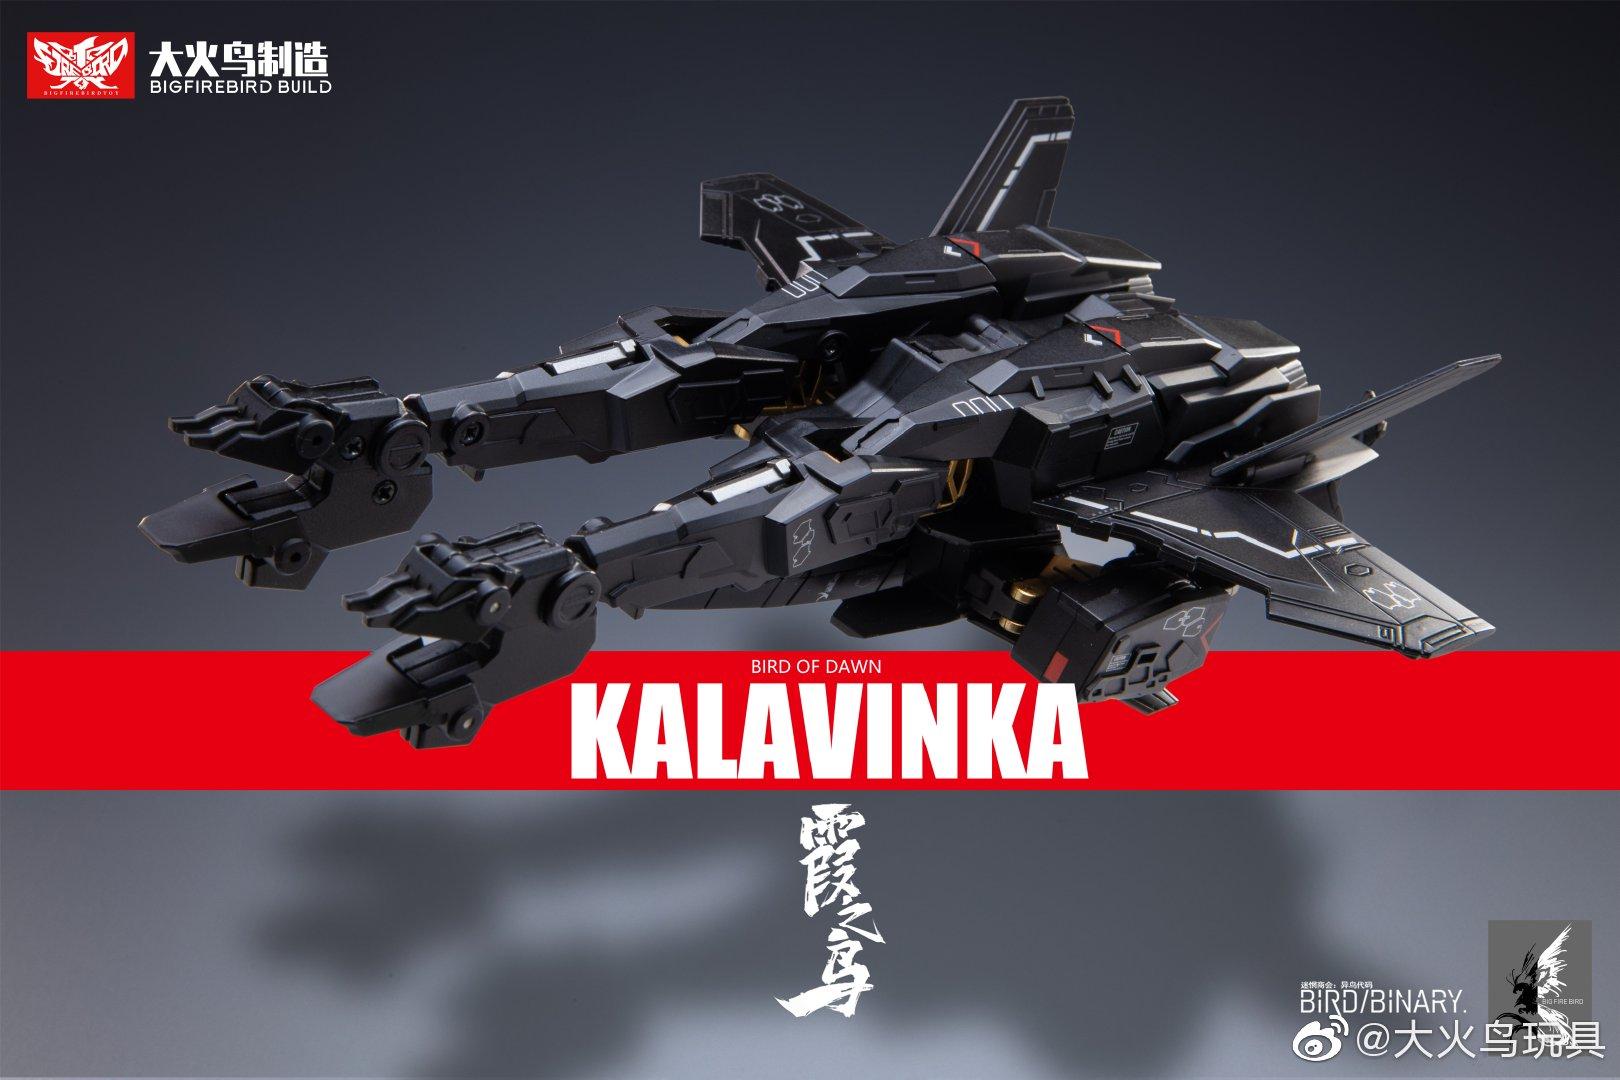 S507_KALAVINKA_BIRD_OF_DAWN_010.jpg